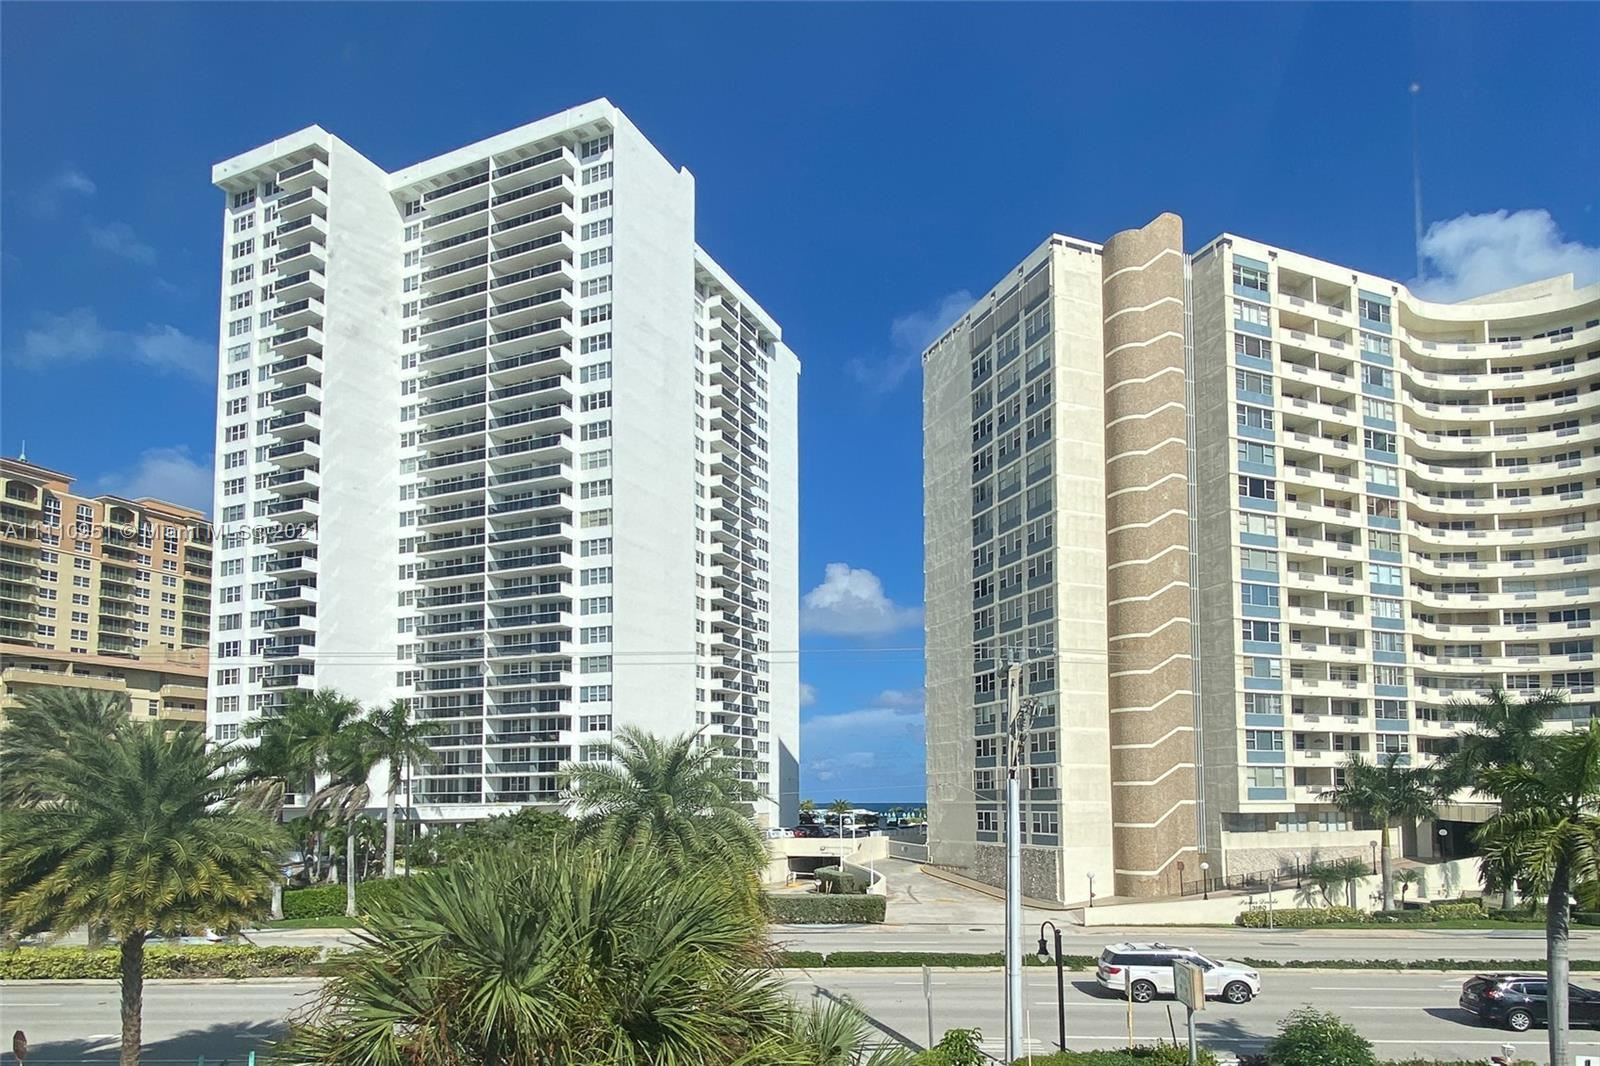 Photo of 3177 S Ocean Dr #303, Hallandale Beach, FL 33009 (MLS # A11110951)